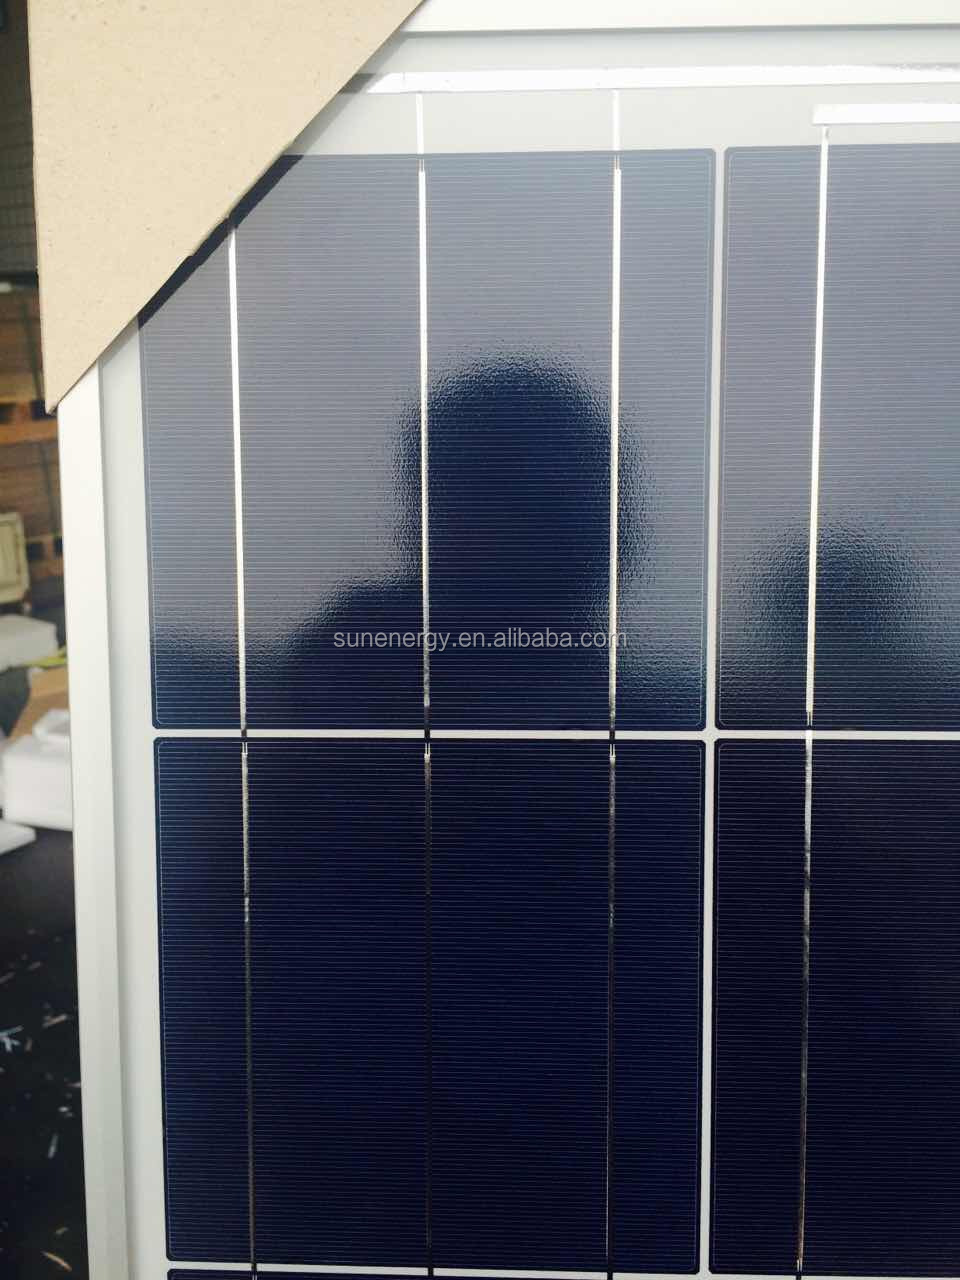 Trina Solar 370w Datasheet